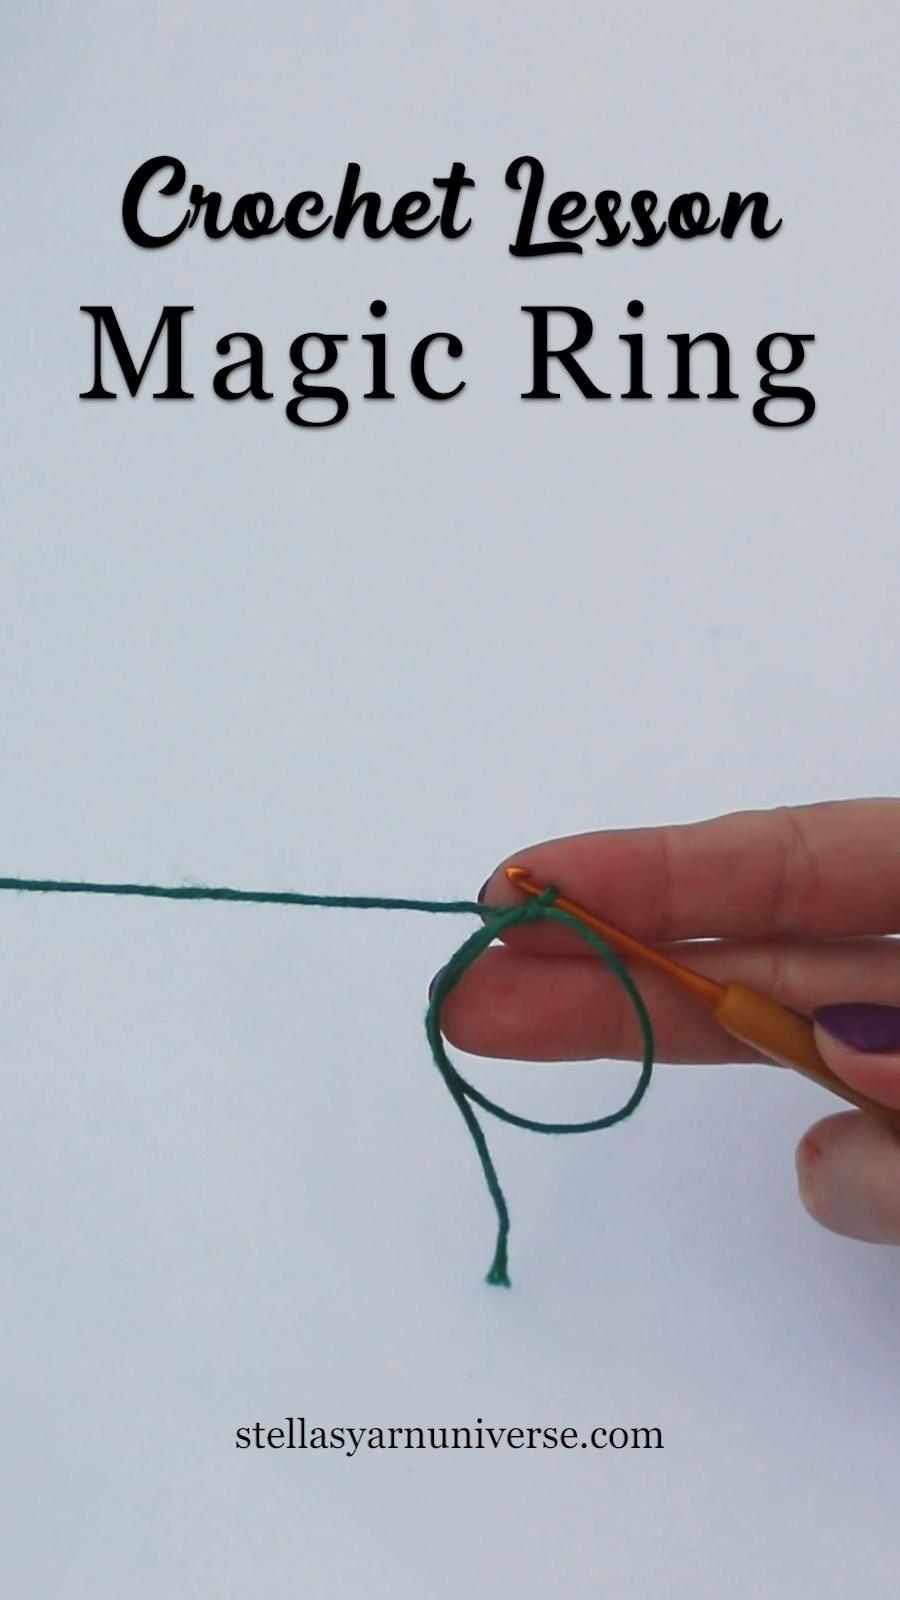 Magic Ring Crochet Lesson